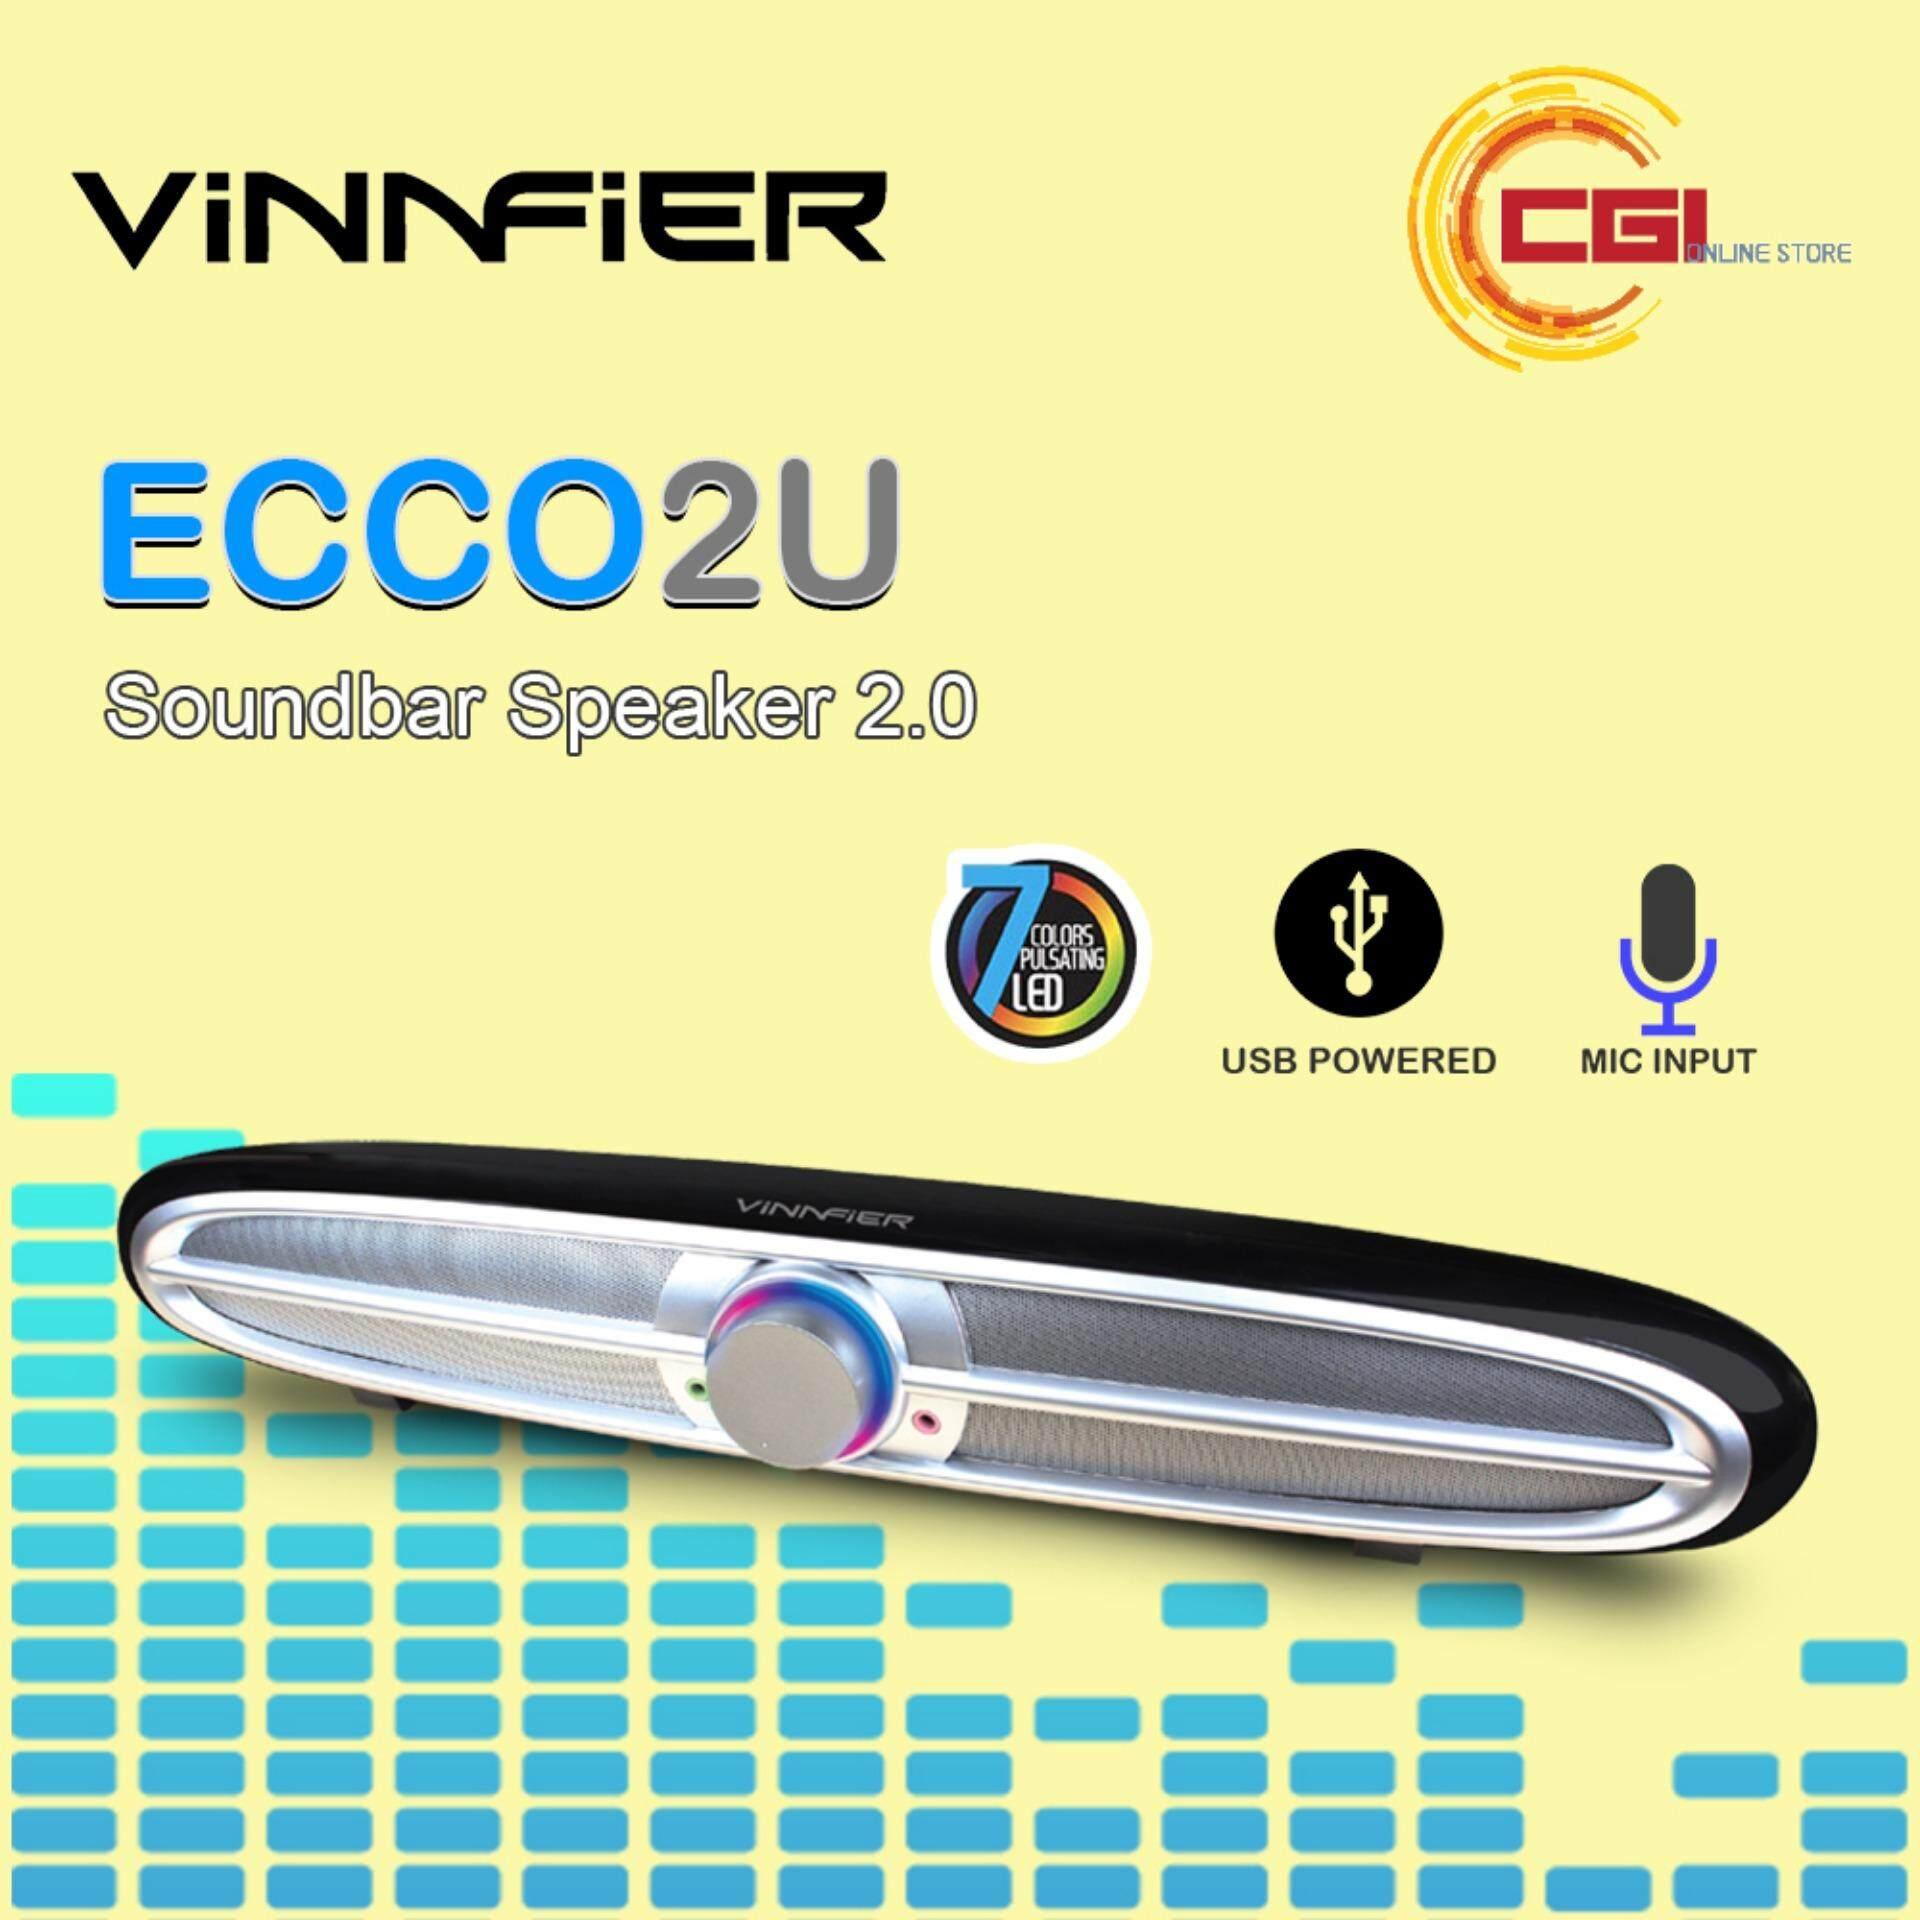 Vinnfier ECCO2U USB Soundbar Speaker 2.0 Malaysia